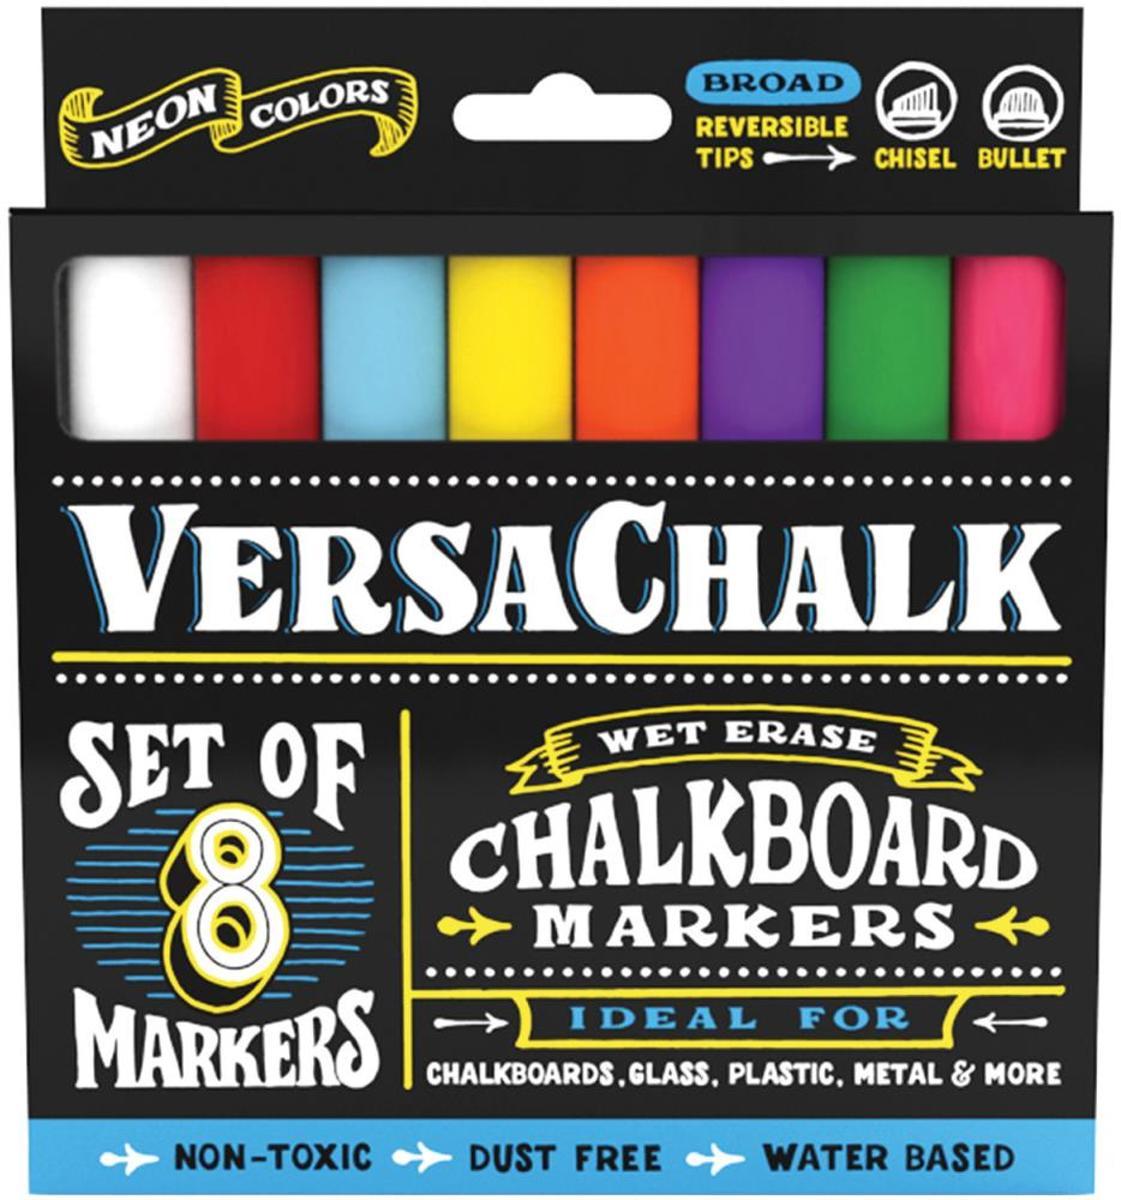 VersaChalk- Liquid Chalkboard Markers - bold- 10 stuks - Neon